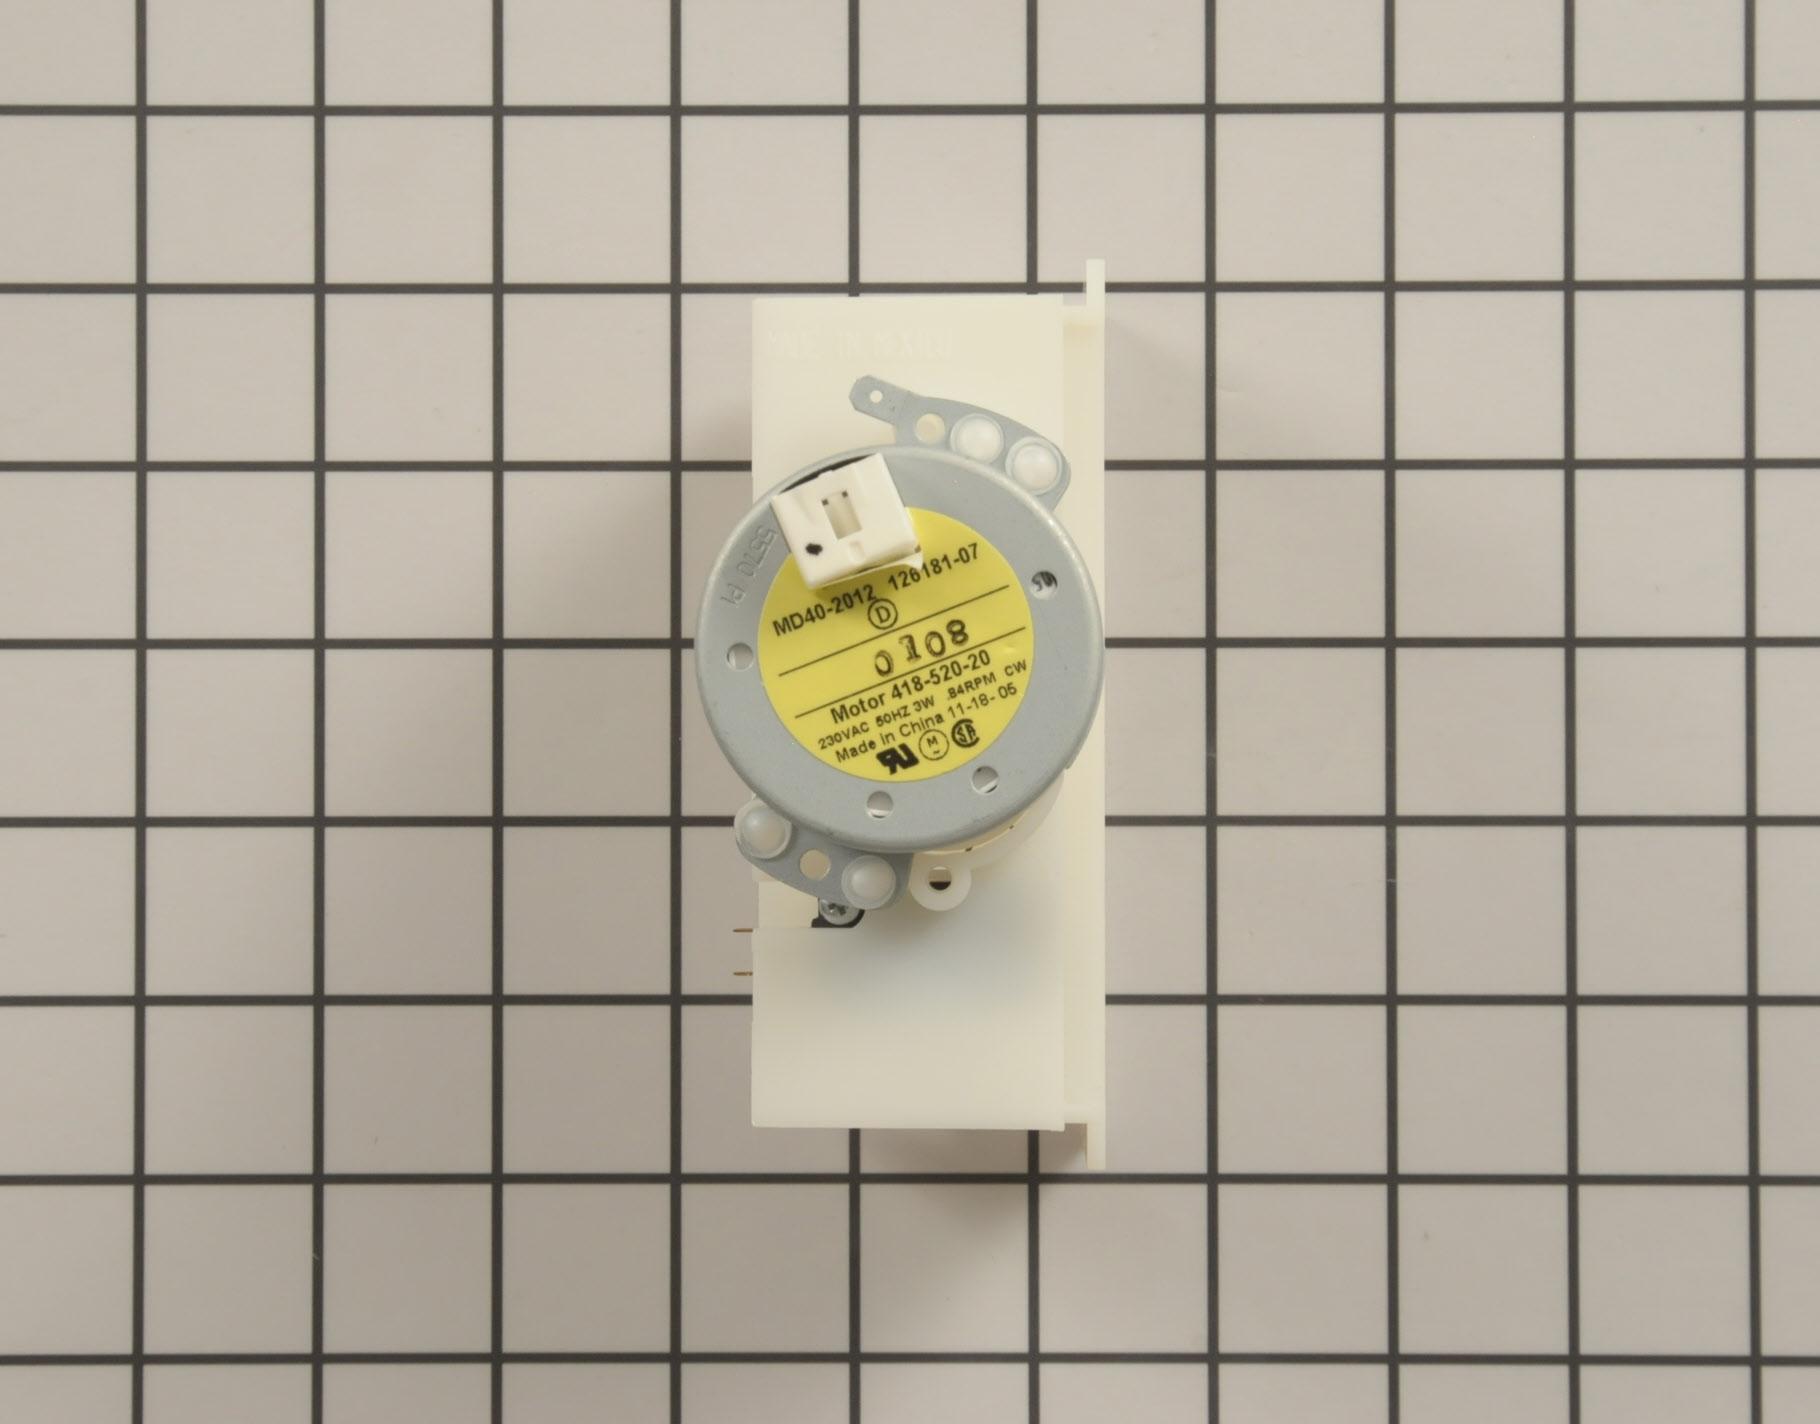 WP67005014 Gaggenau Refrigerator Part -Damper Control Assembly